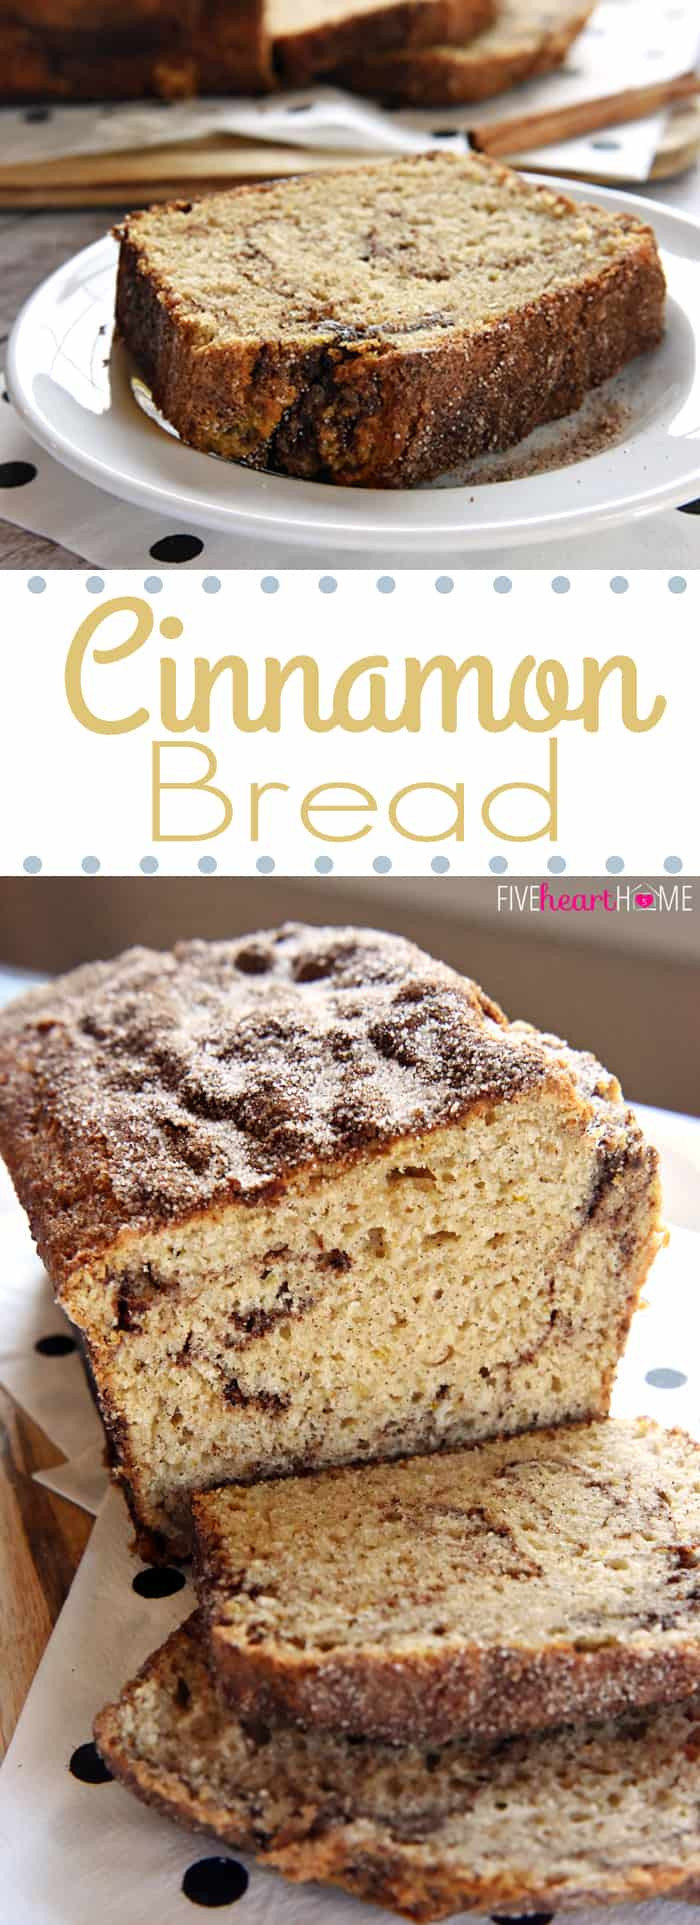 Bread Recipe No Yeast  Cinnamon Bread No Yeast Quick Bread